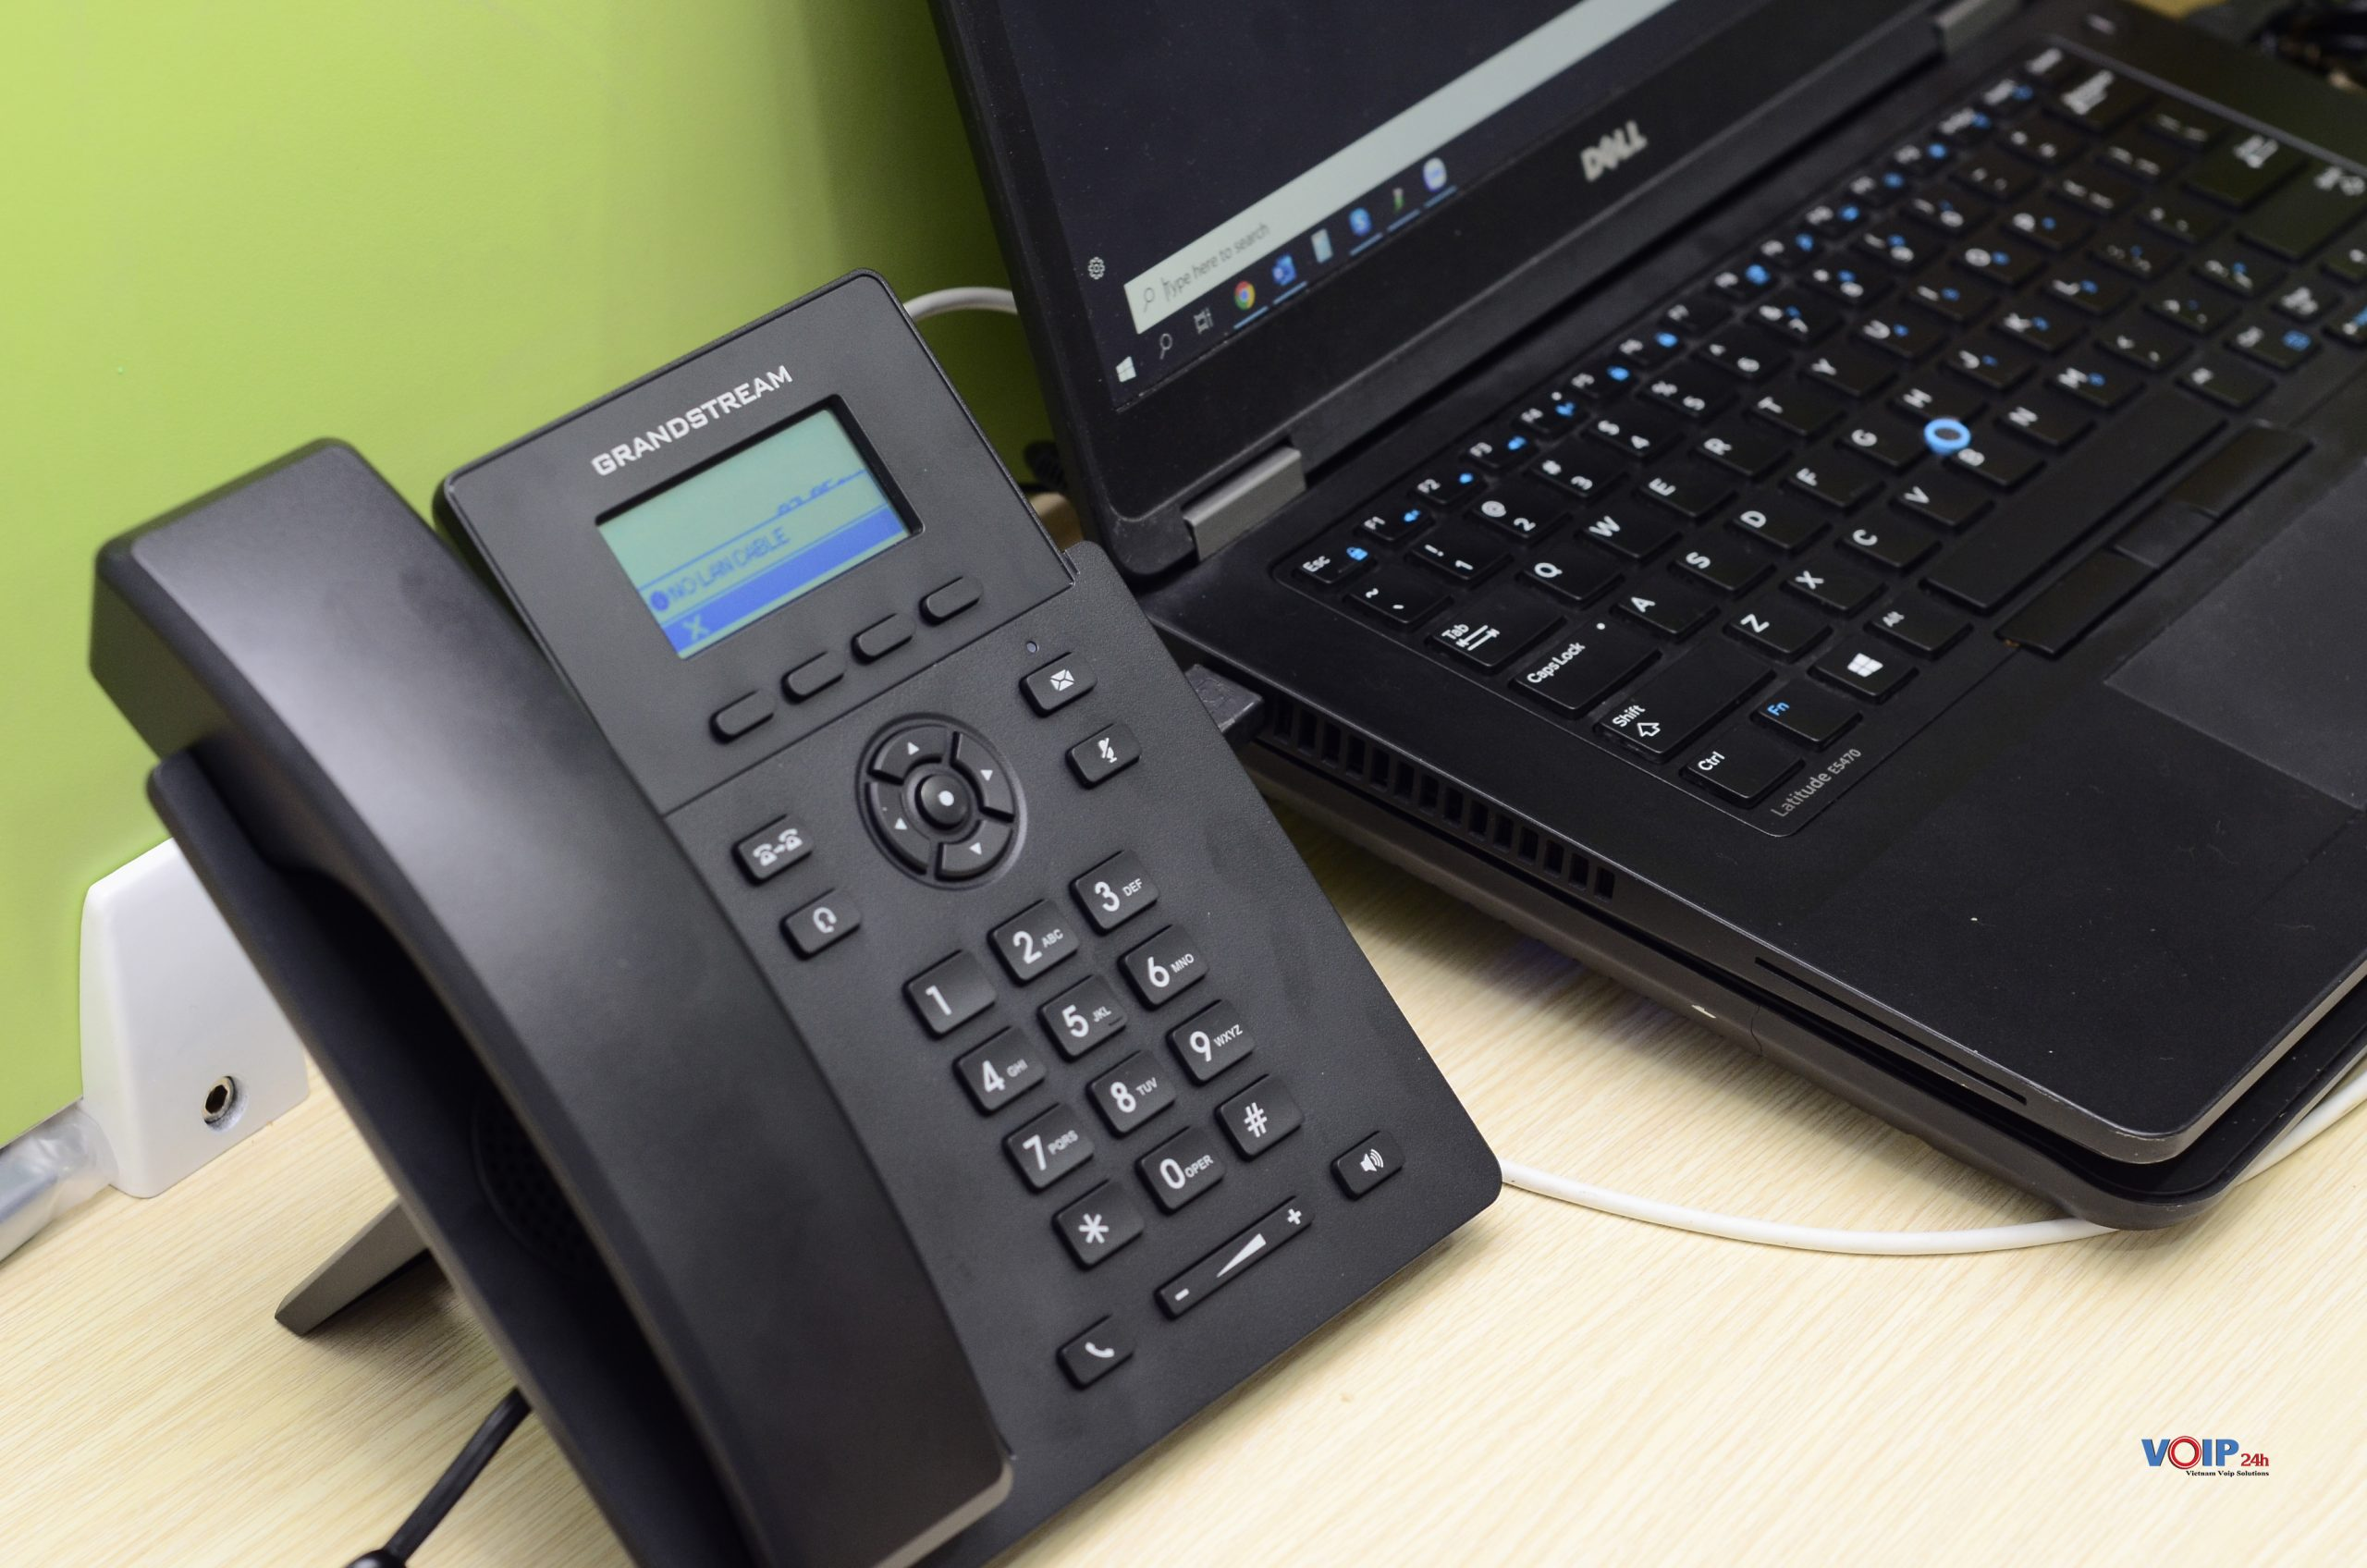 Điện thoại Grandstream GRP2601